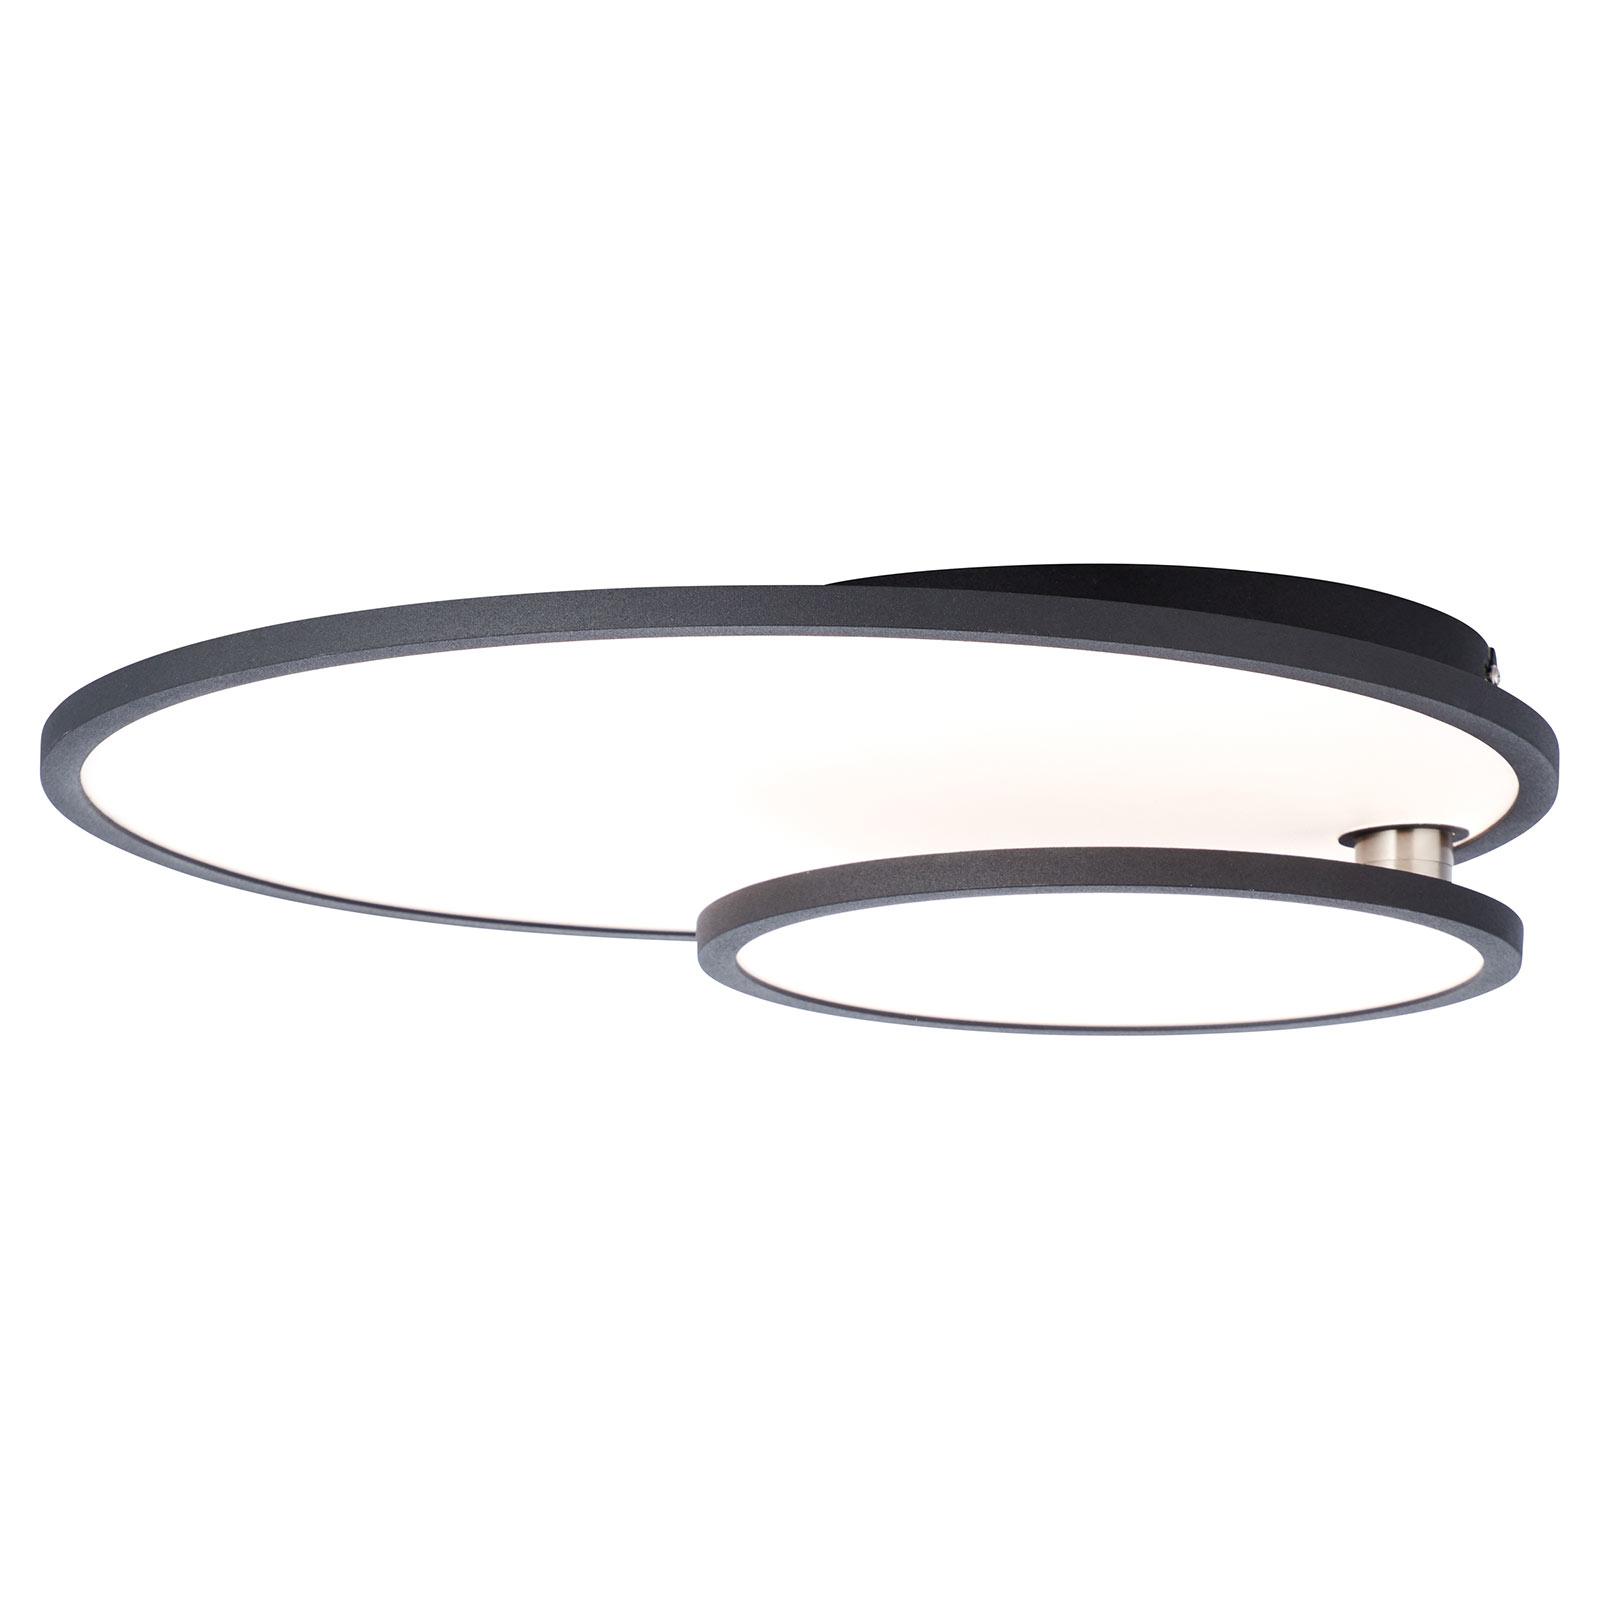 LED plafondlamp Bility, rond, zwart frame